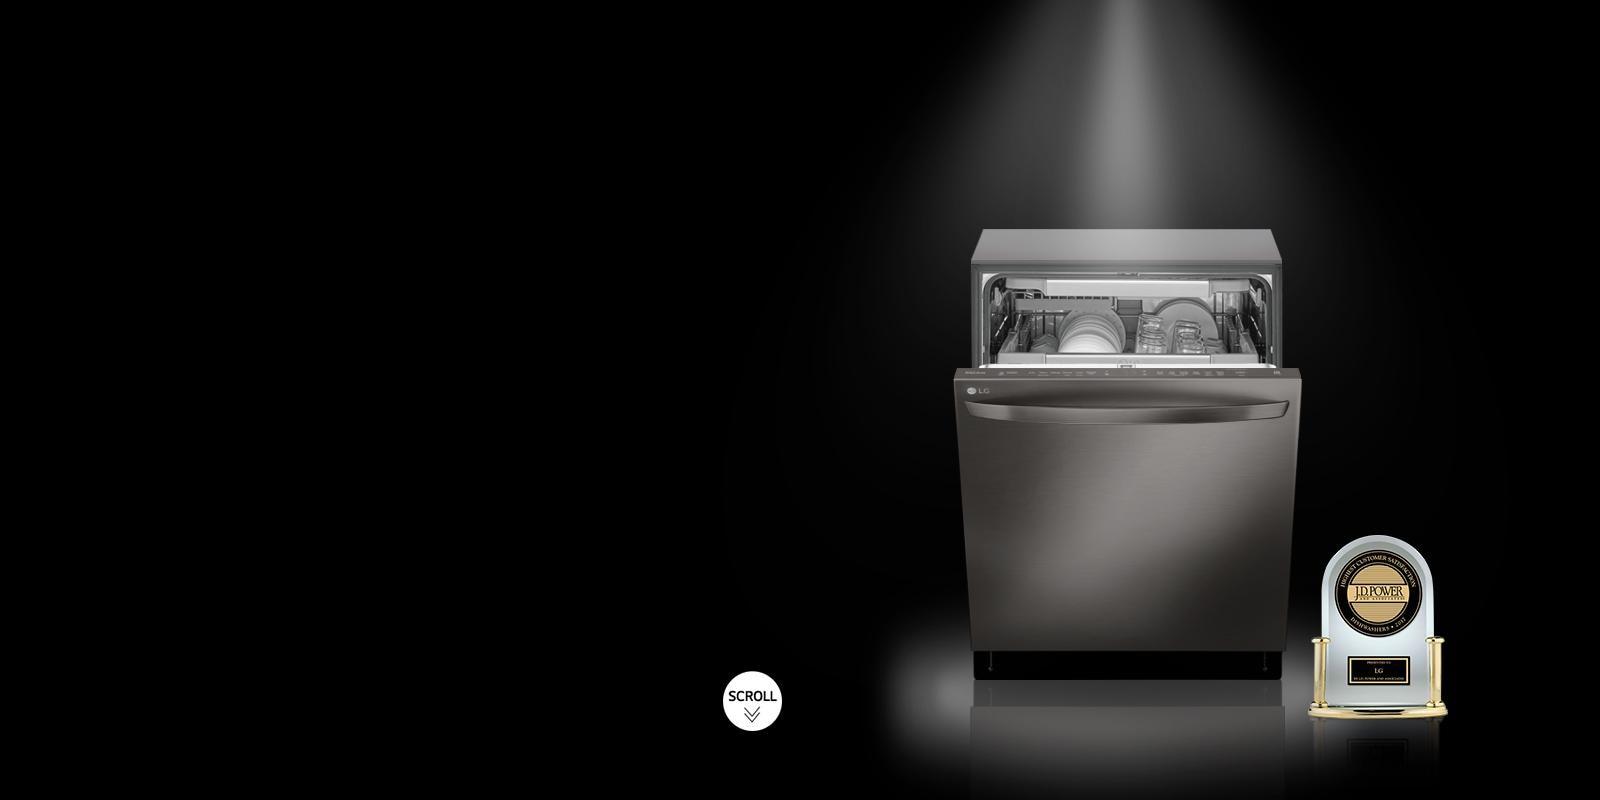 Lg Dishwashers With Innovative Technology